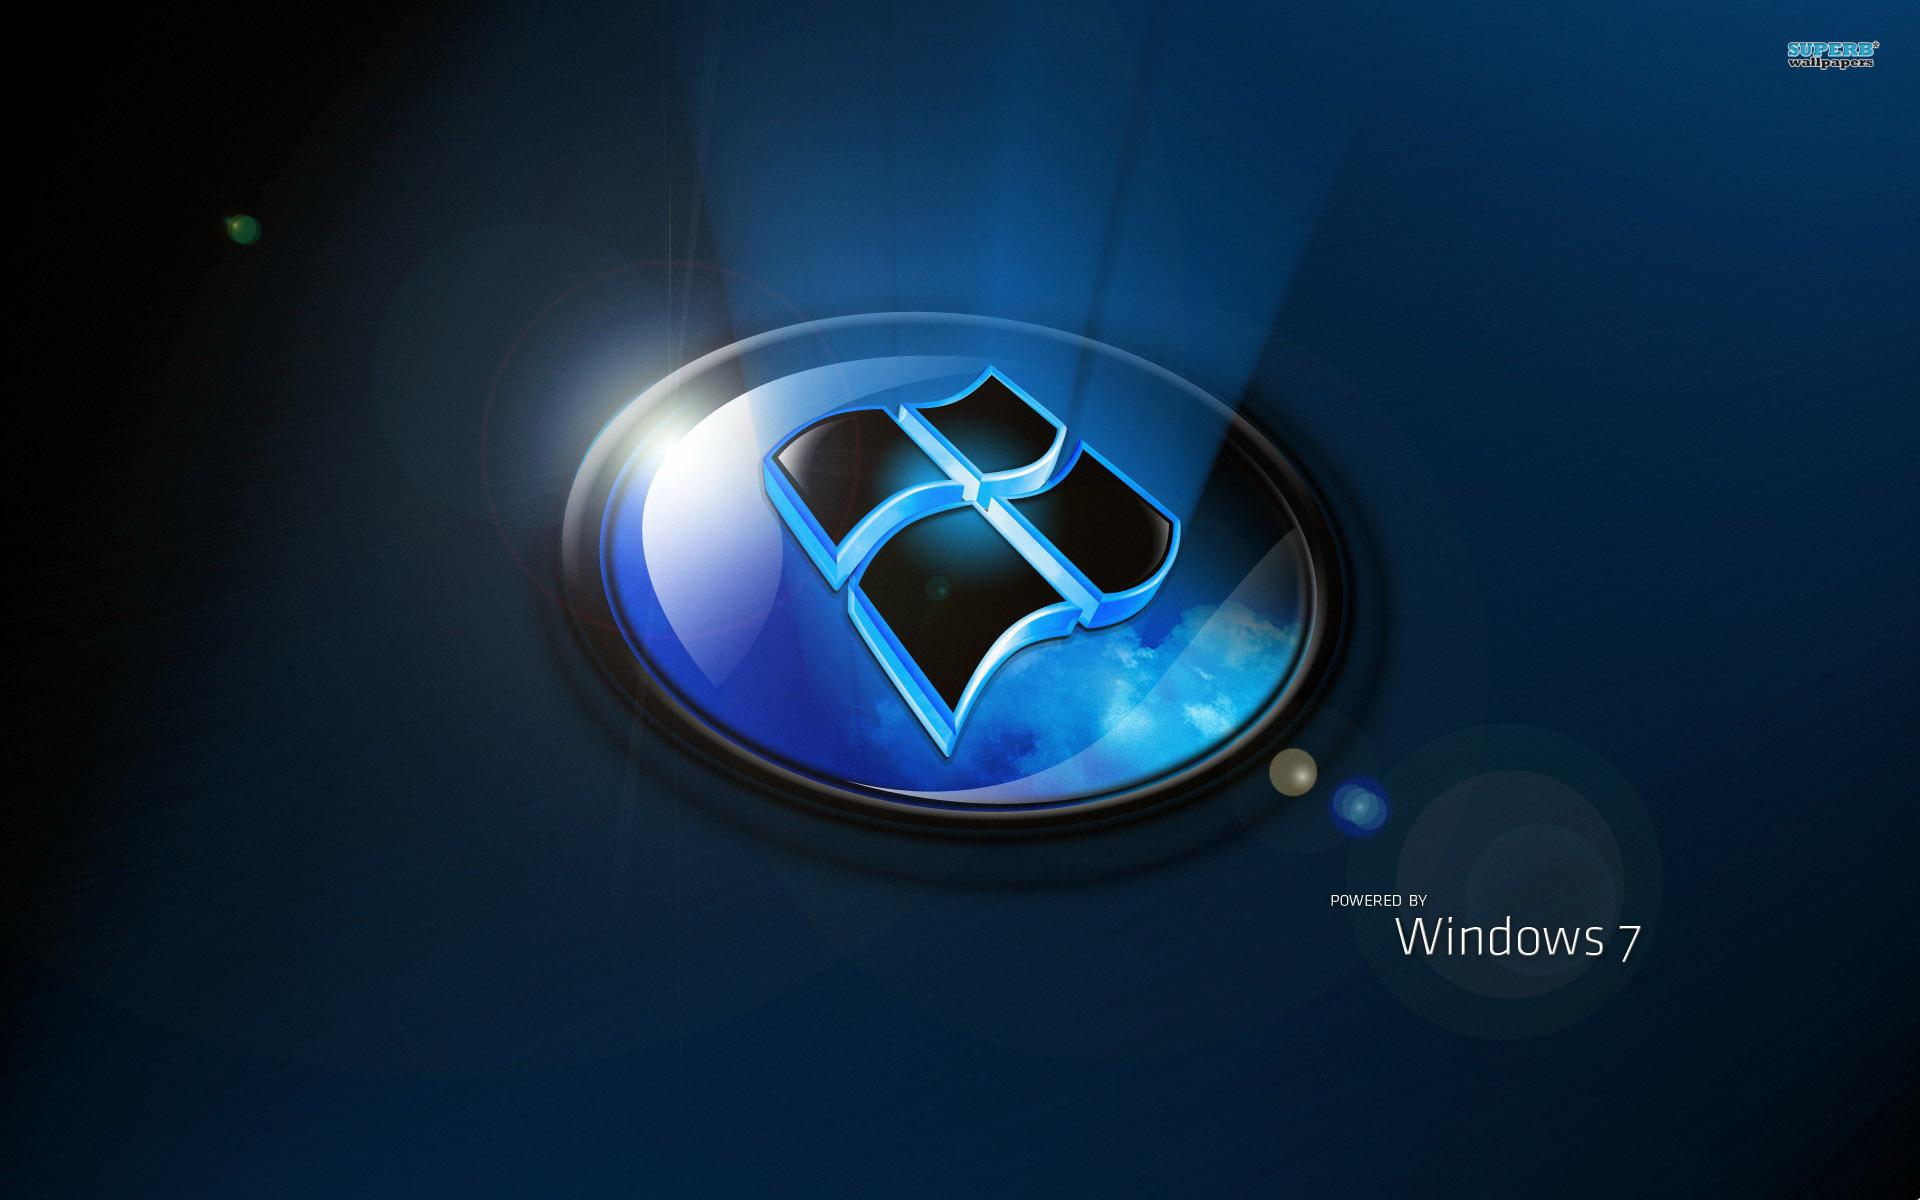 Animated Desktop Backgrounds Windows 7 Posted By Samantha Walker